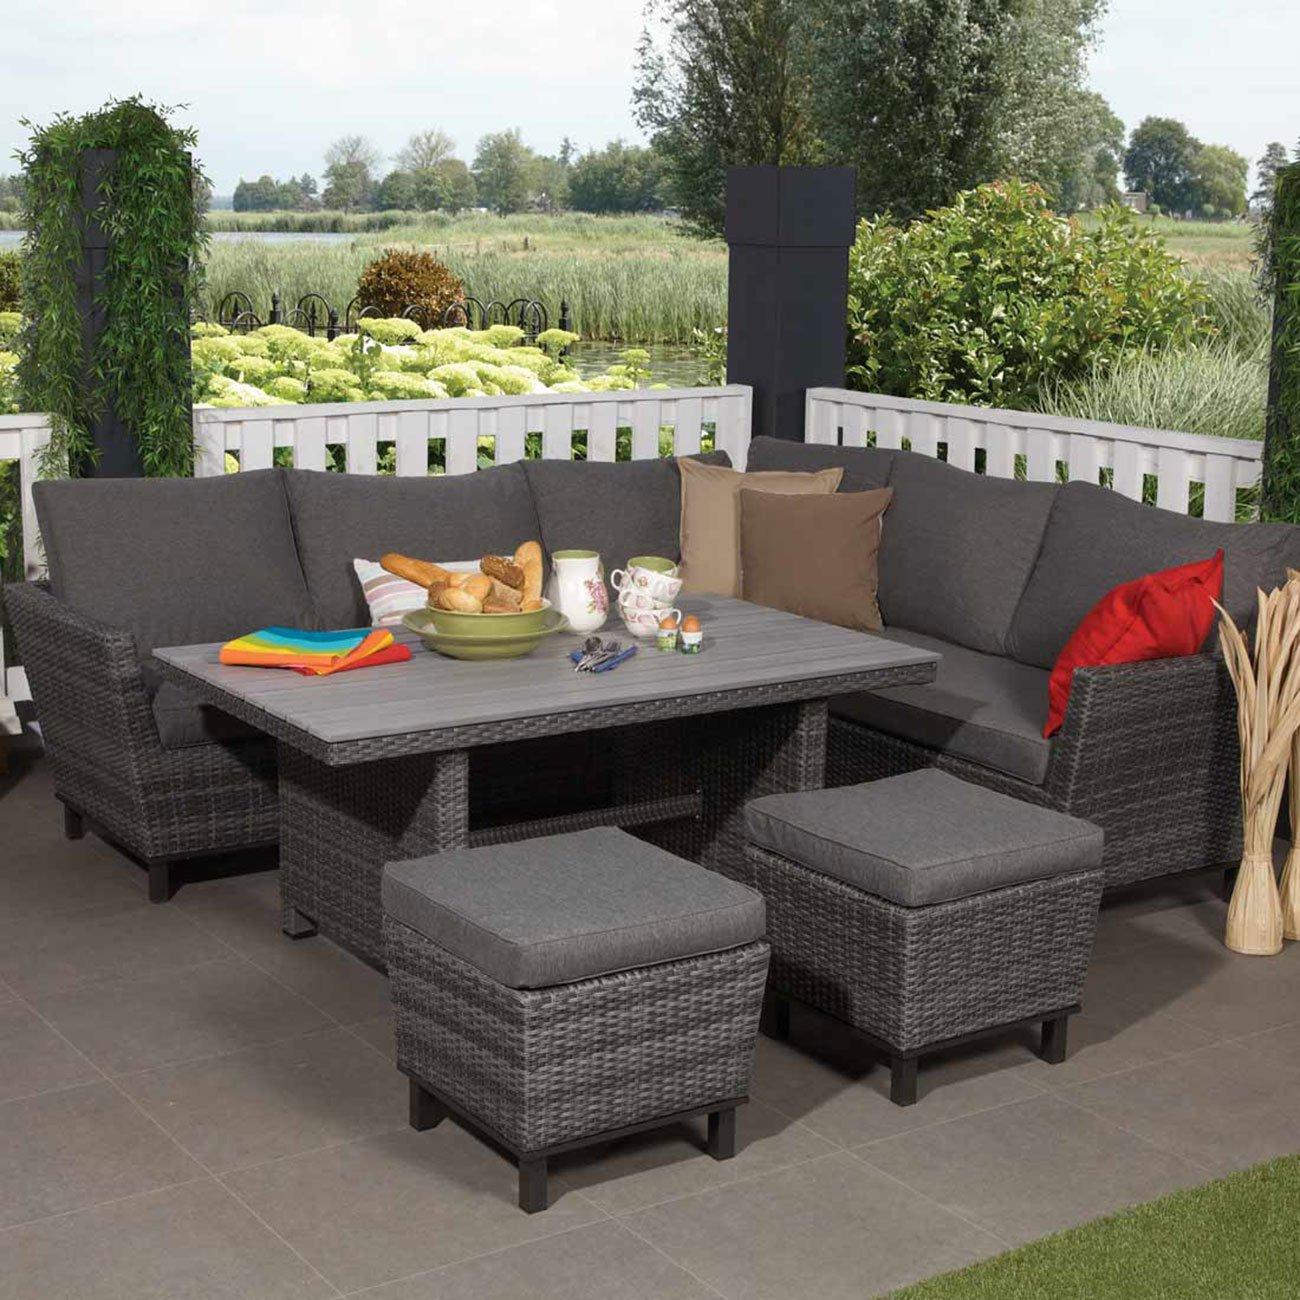 Amazonde Outliv Rattan Lounge Sitzlounge Garten Grau 5tlg M